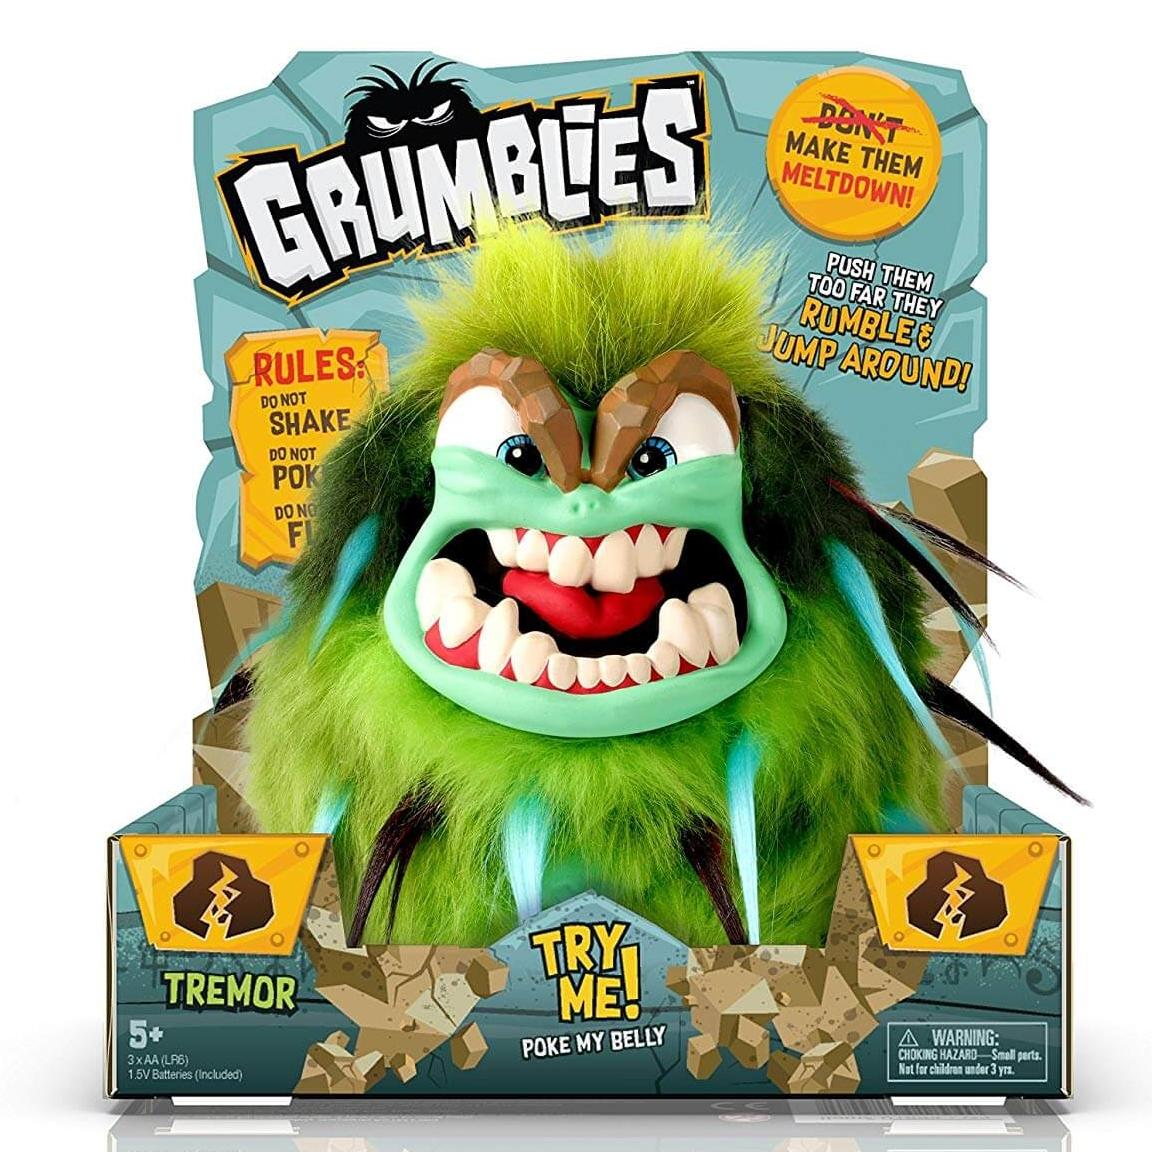 Grumblies Tremor Green